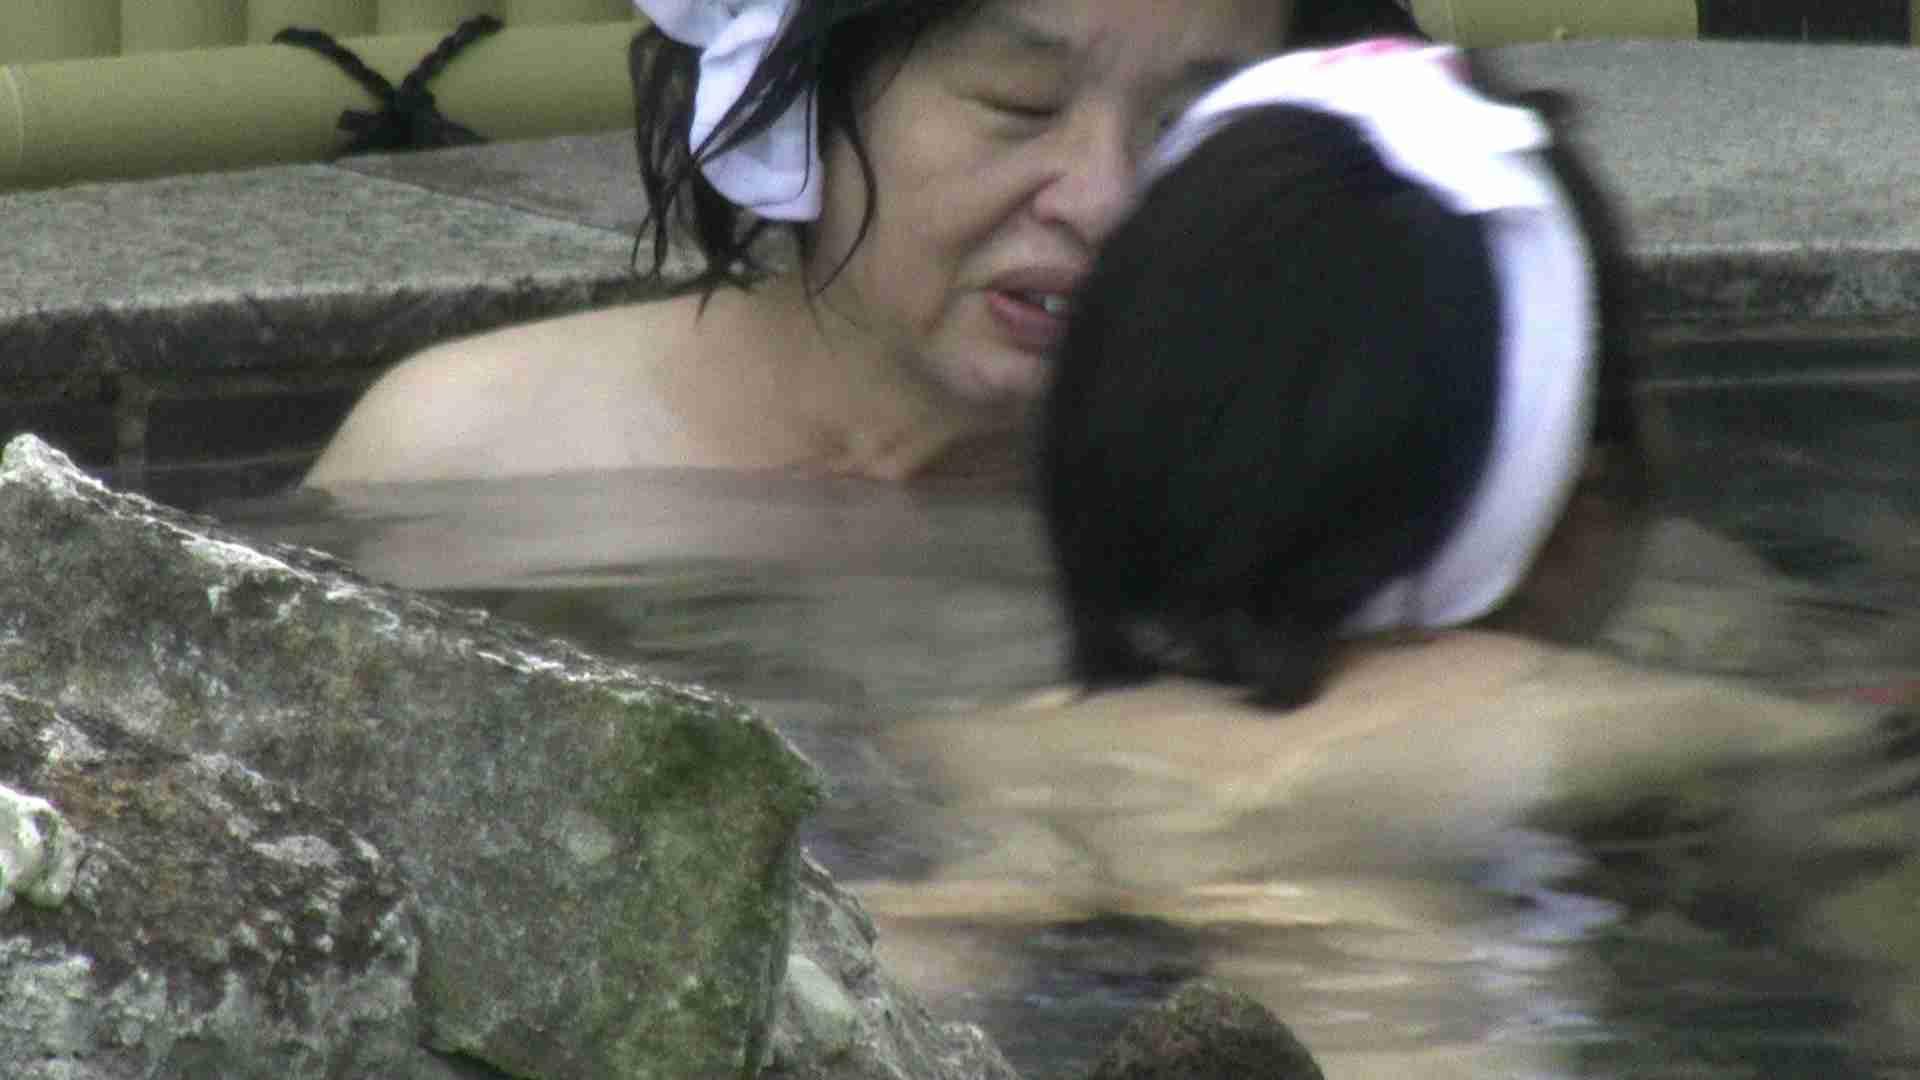 Aquaな露天風呂Vol.179 露天 おまんこ無修正動画無料 78PICs 53